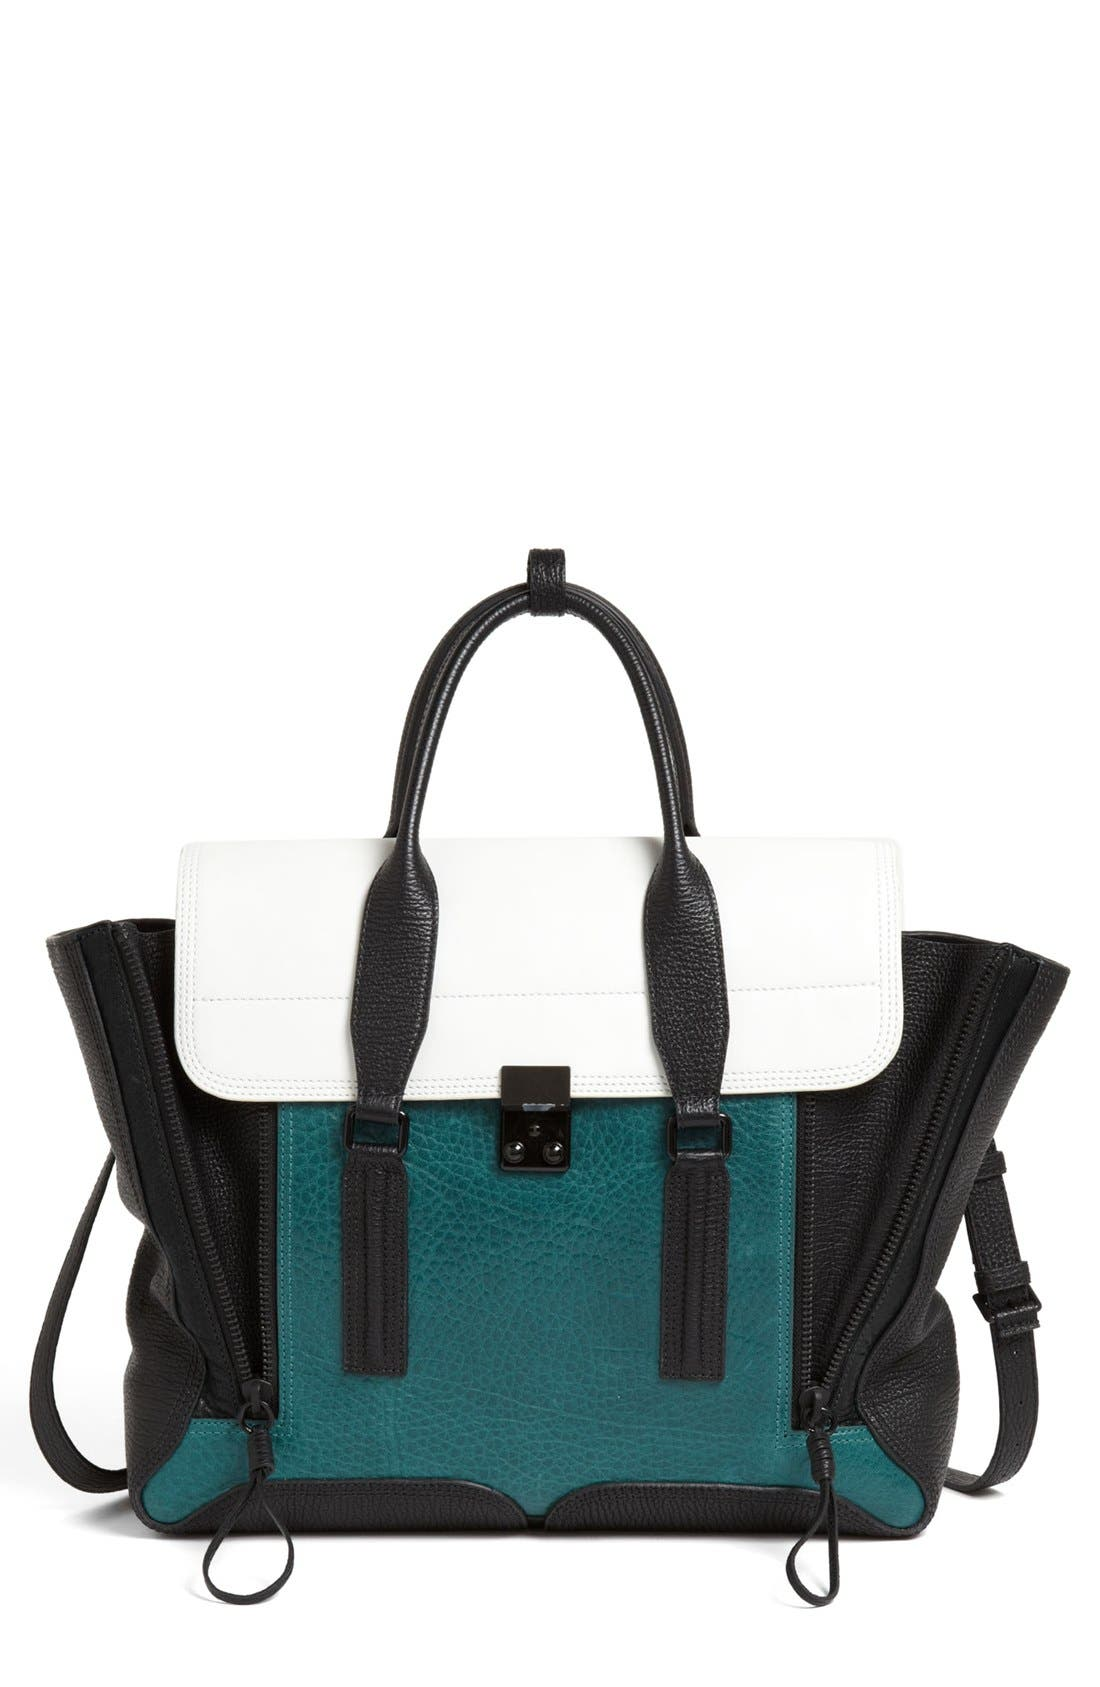 'Pashli' Colorblock Leather Crossbody Satchel,                         Main,                         color, 445